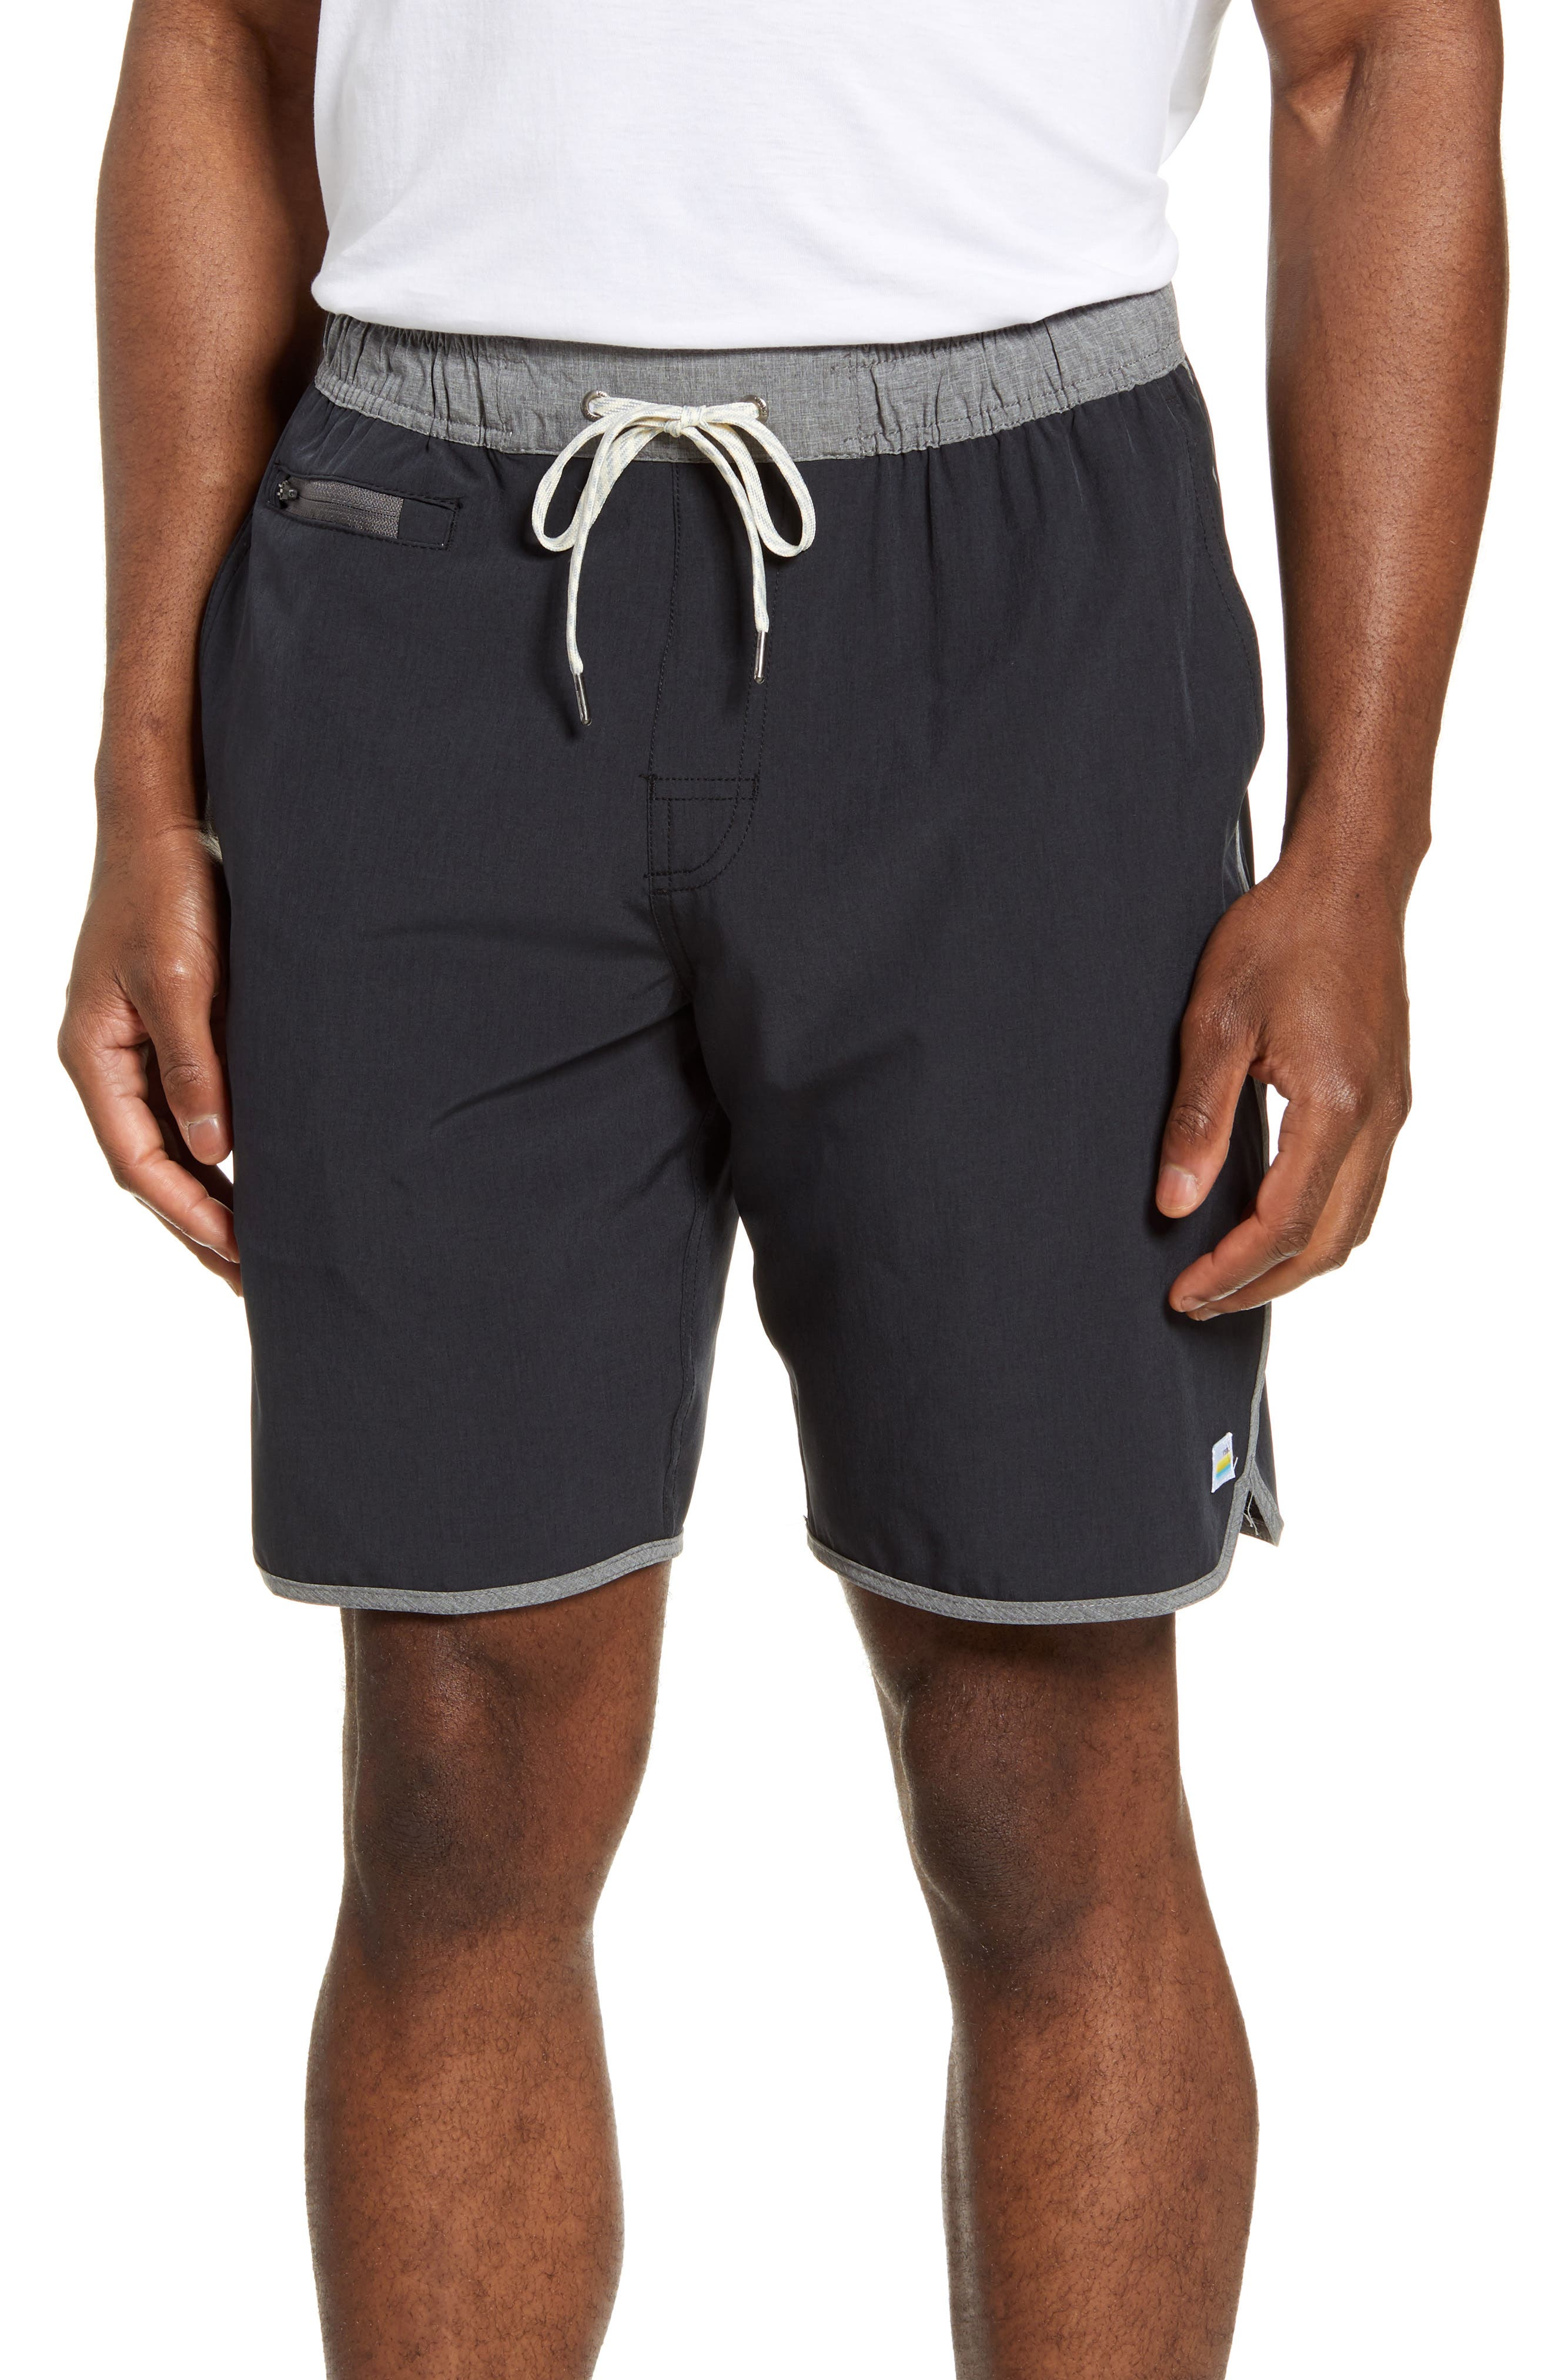 University of Notre Dame Nd Logo Mens Beach Pants Swim Trunks Quick Dry Beachwear Sports Running Swim Board Shorts